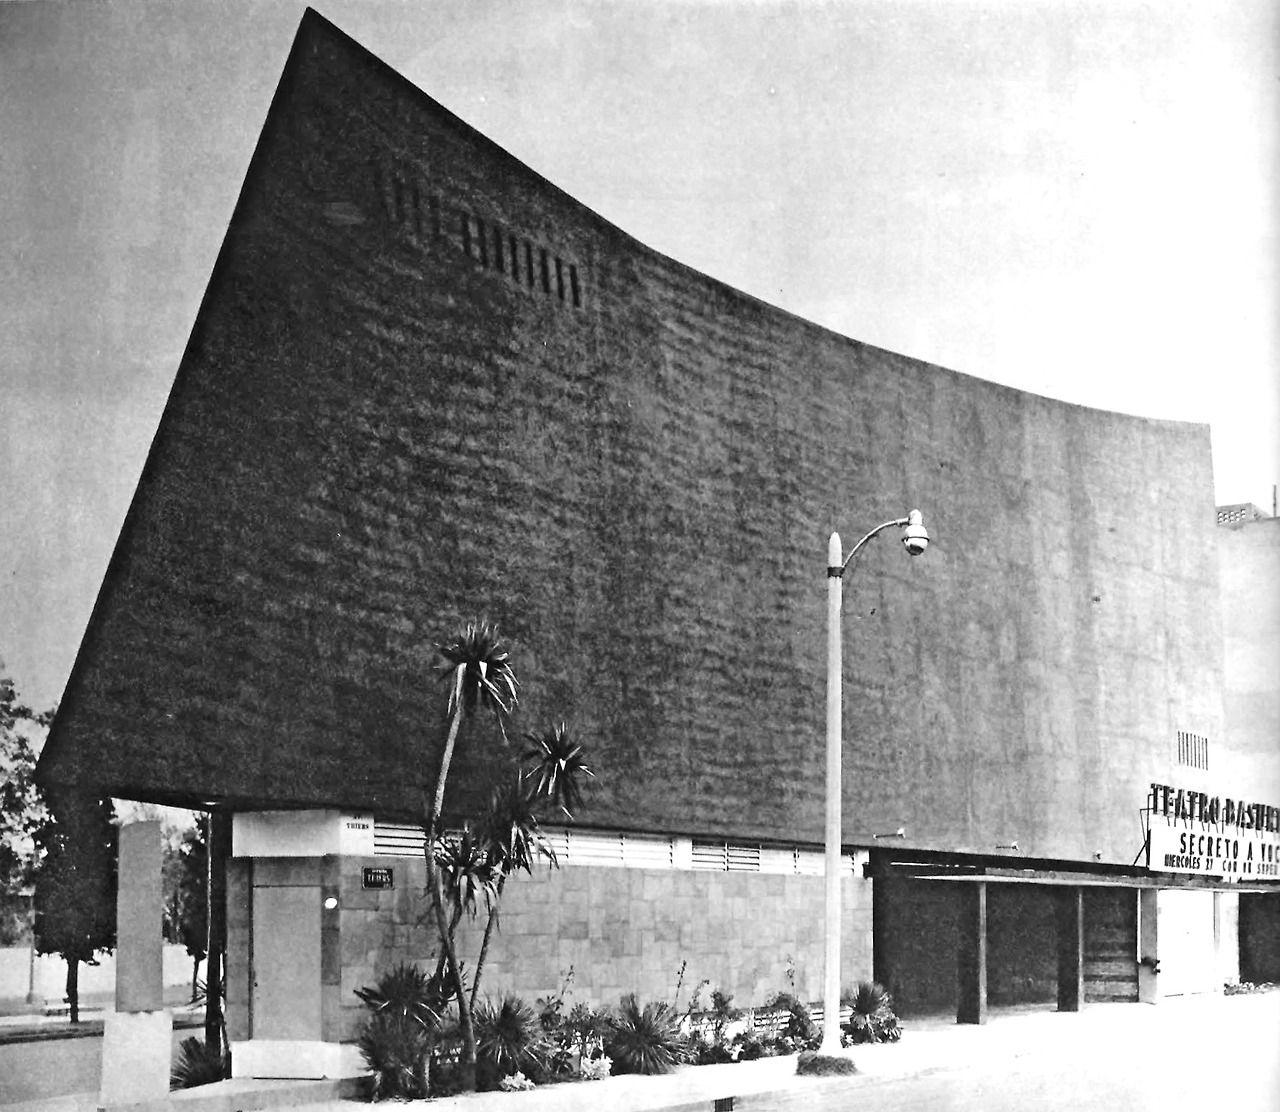 Teatro Basurto, calle Thiers 287 esq. Ejército Nacional, Col. Anzures, México DF 1959   Arq. Nicolás Mariscal Barroso  Foto. Armando Salas Portugal